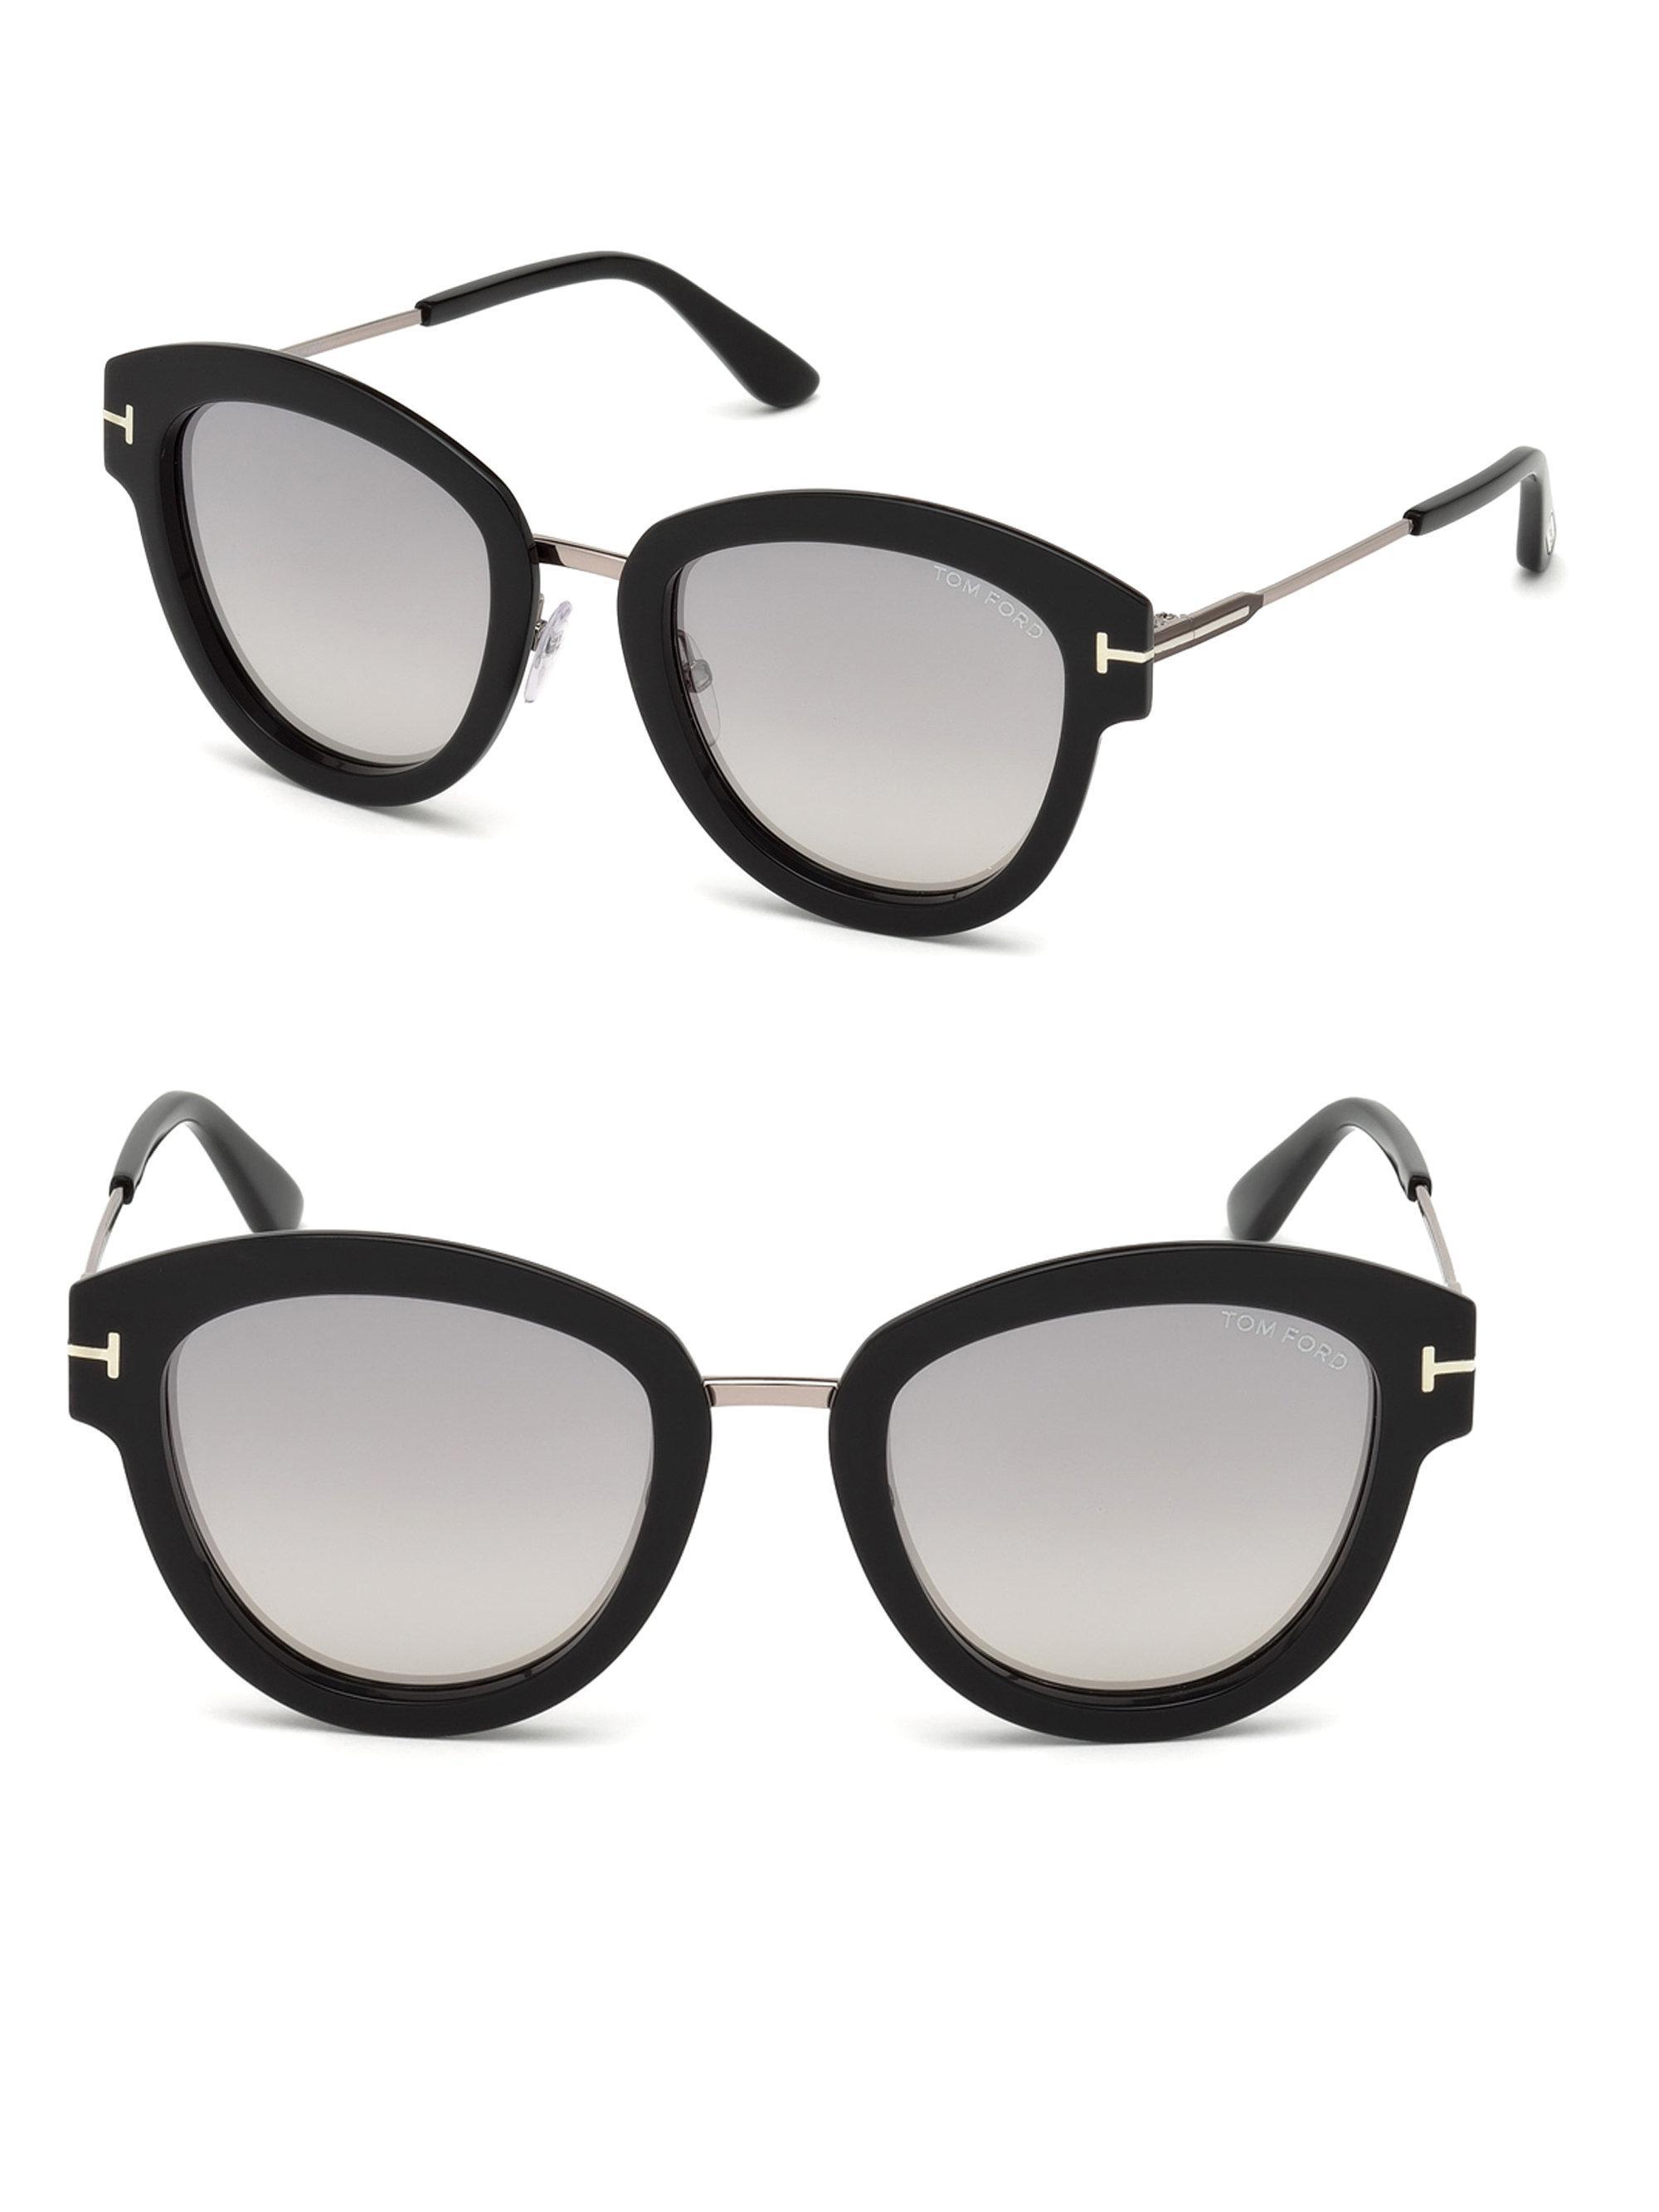 d7c6fbd5085d0 Tom Ford Women s Mia Cat Eye Sunglasses - Silver Black in Black - Lyst